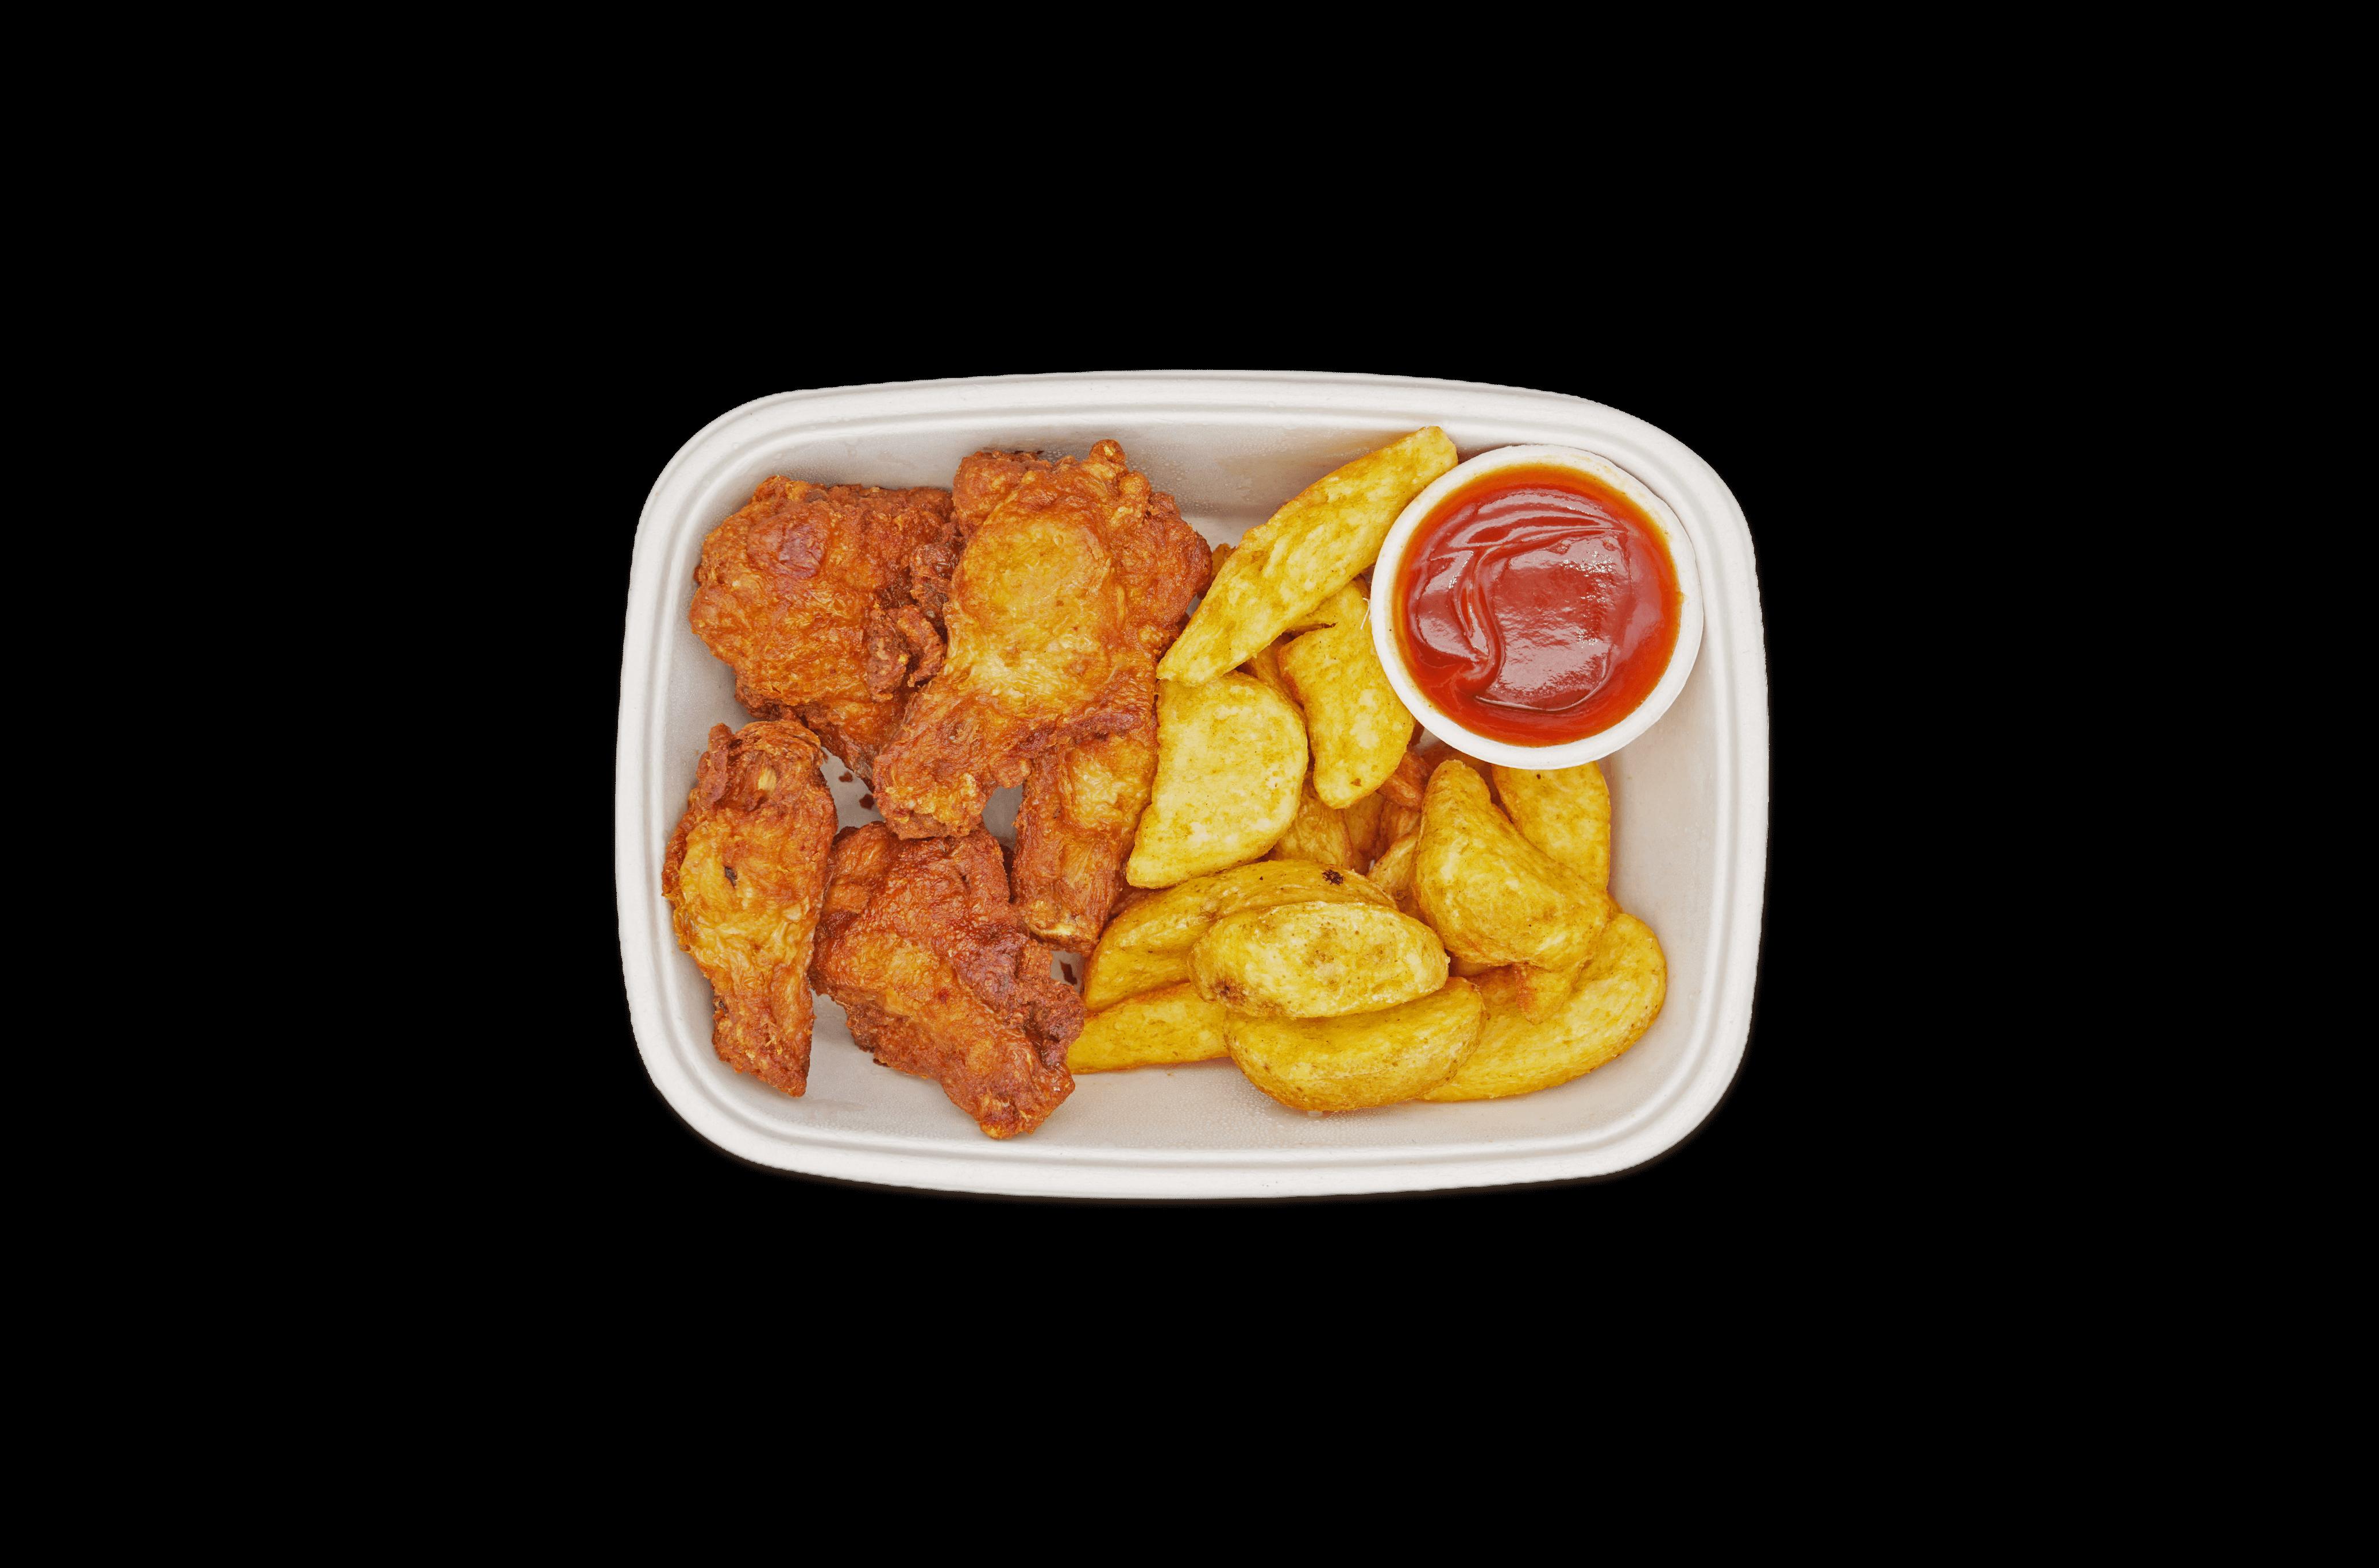 Würzige Chickenwings mit Kartoffelecken